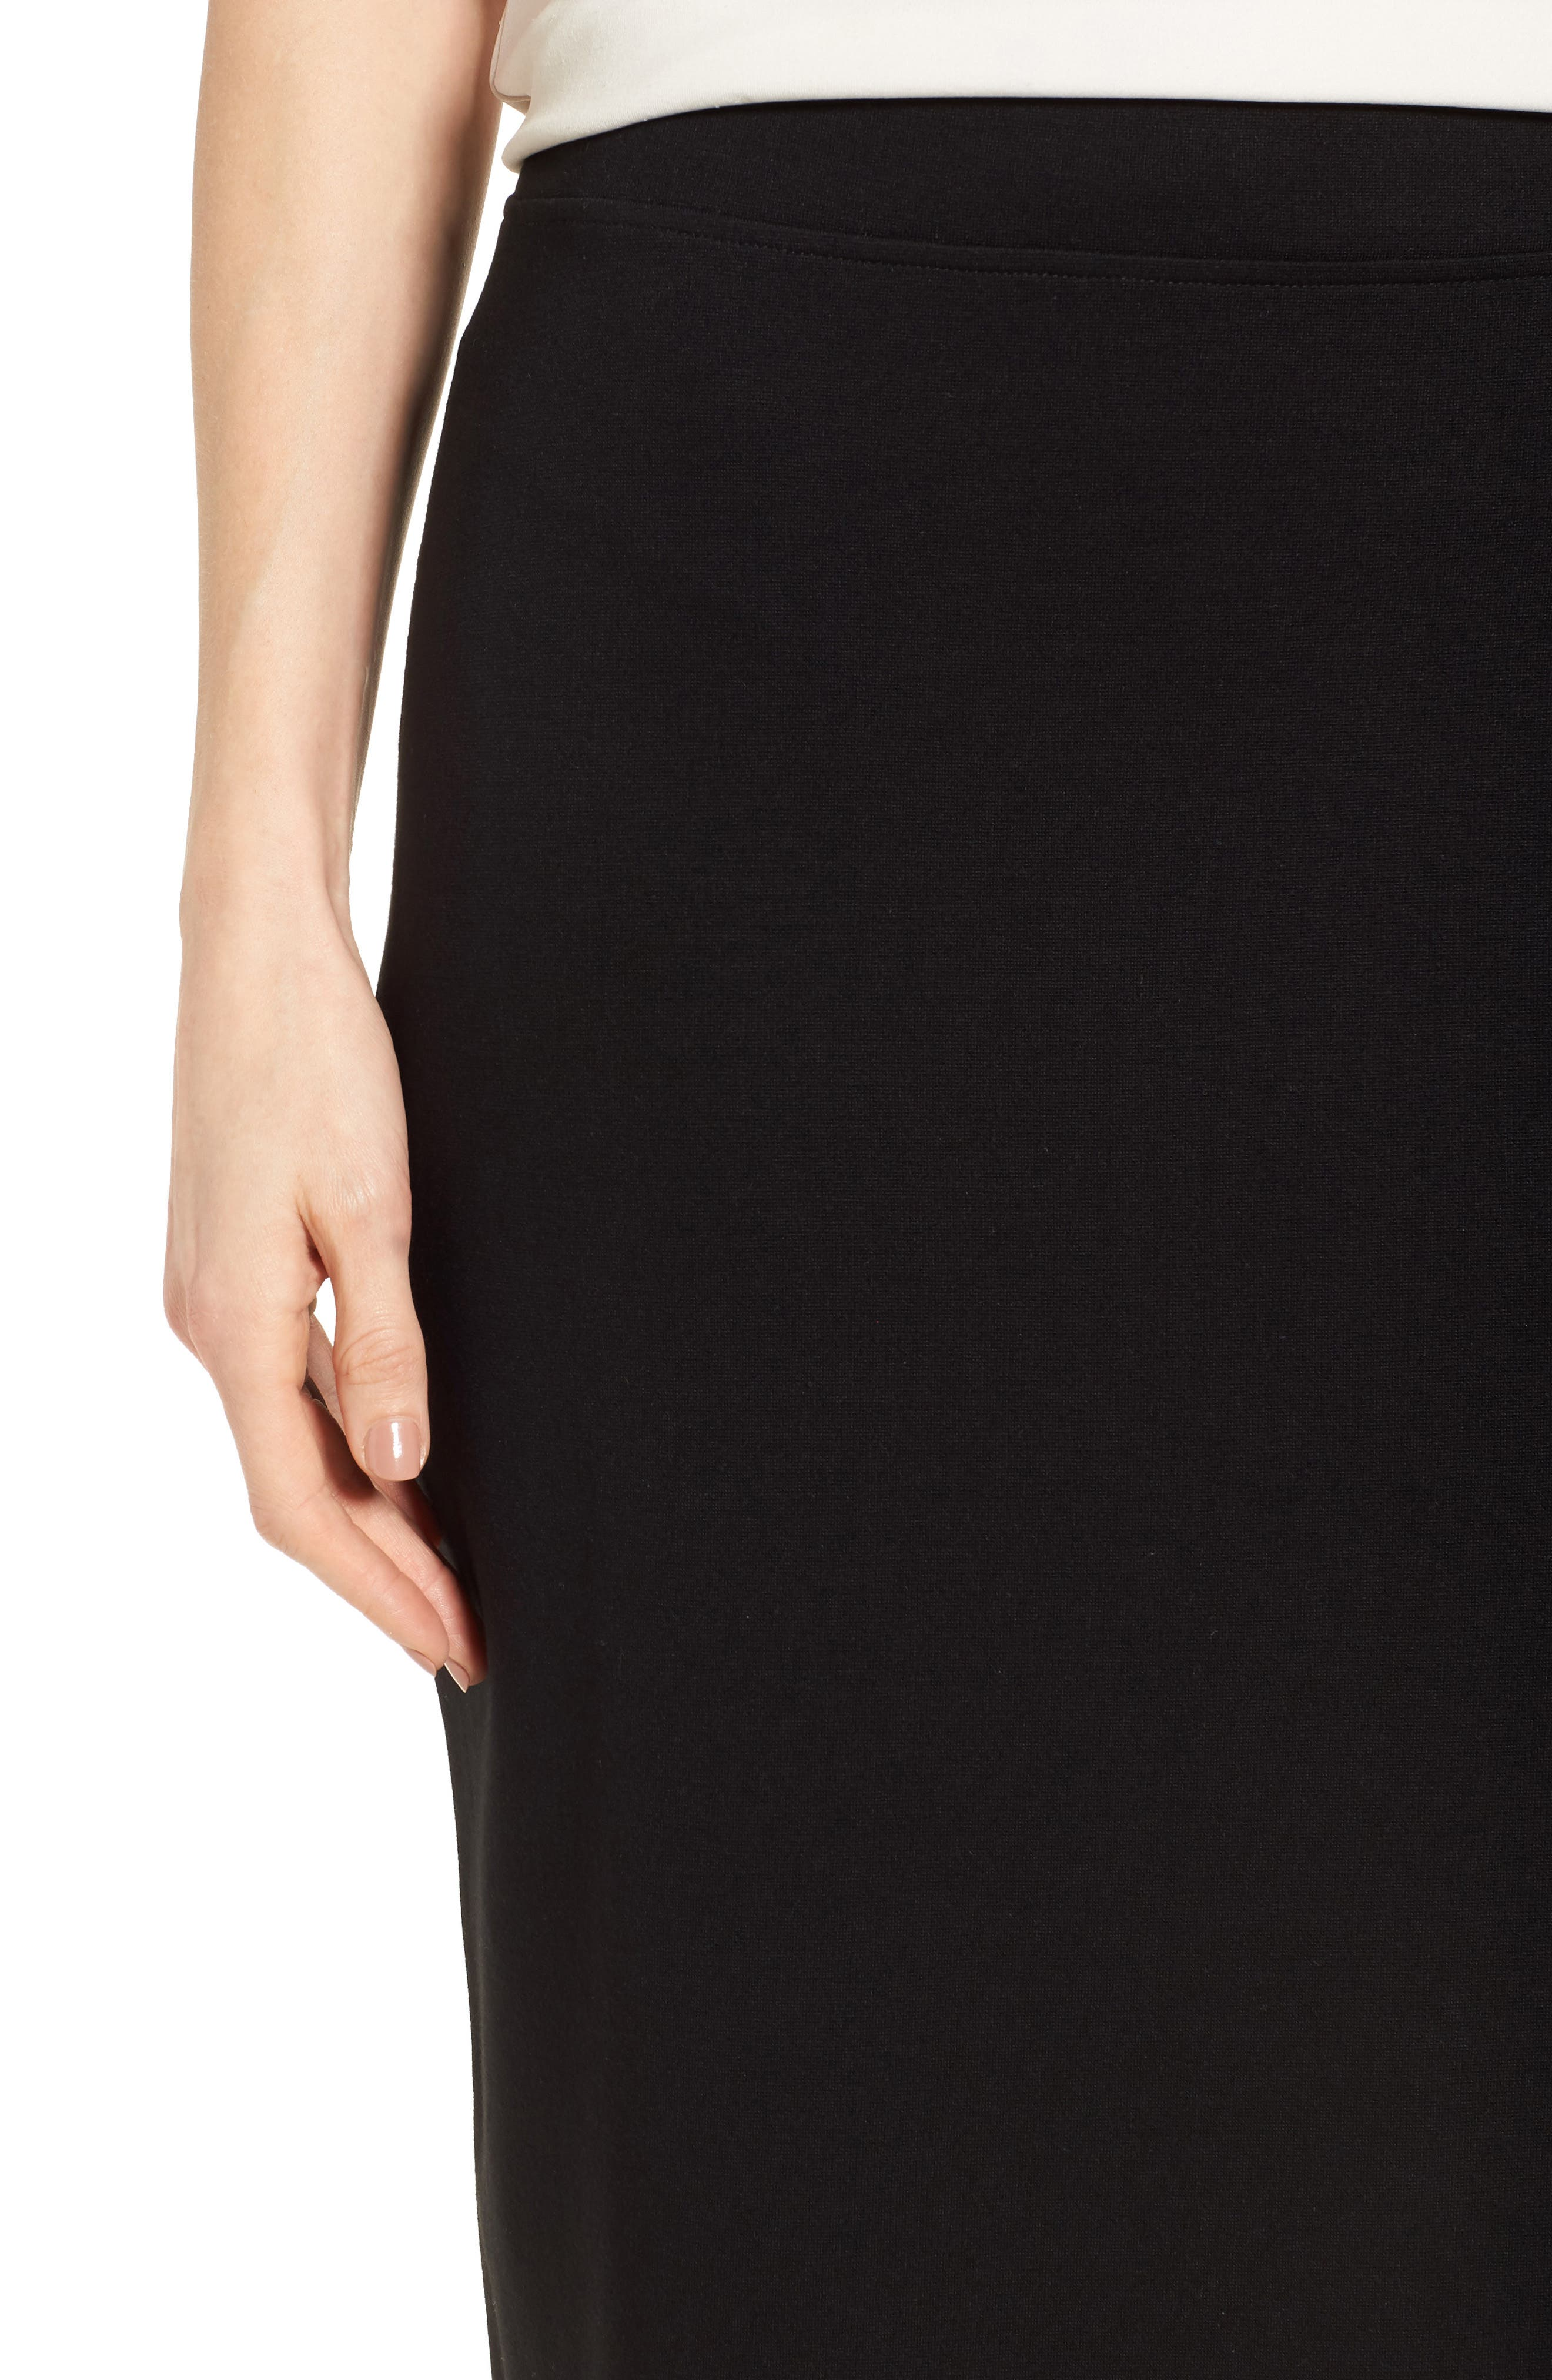 Tencel<sup>®</sup> Lyocell Blend Knit Pencil Skirt,                             Alternate thumbnail 4, color,